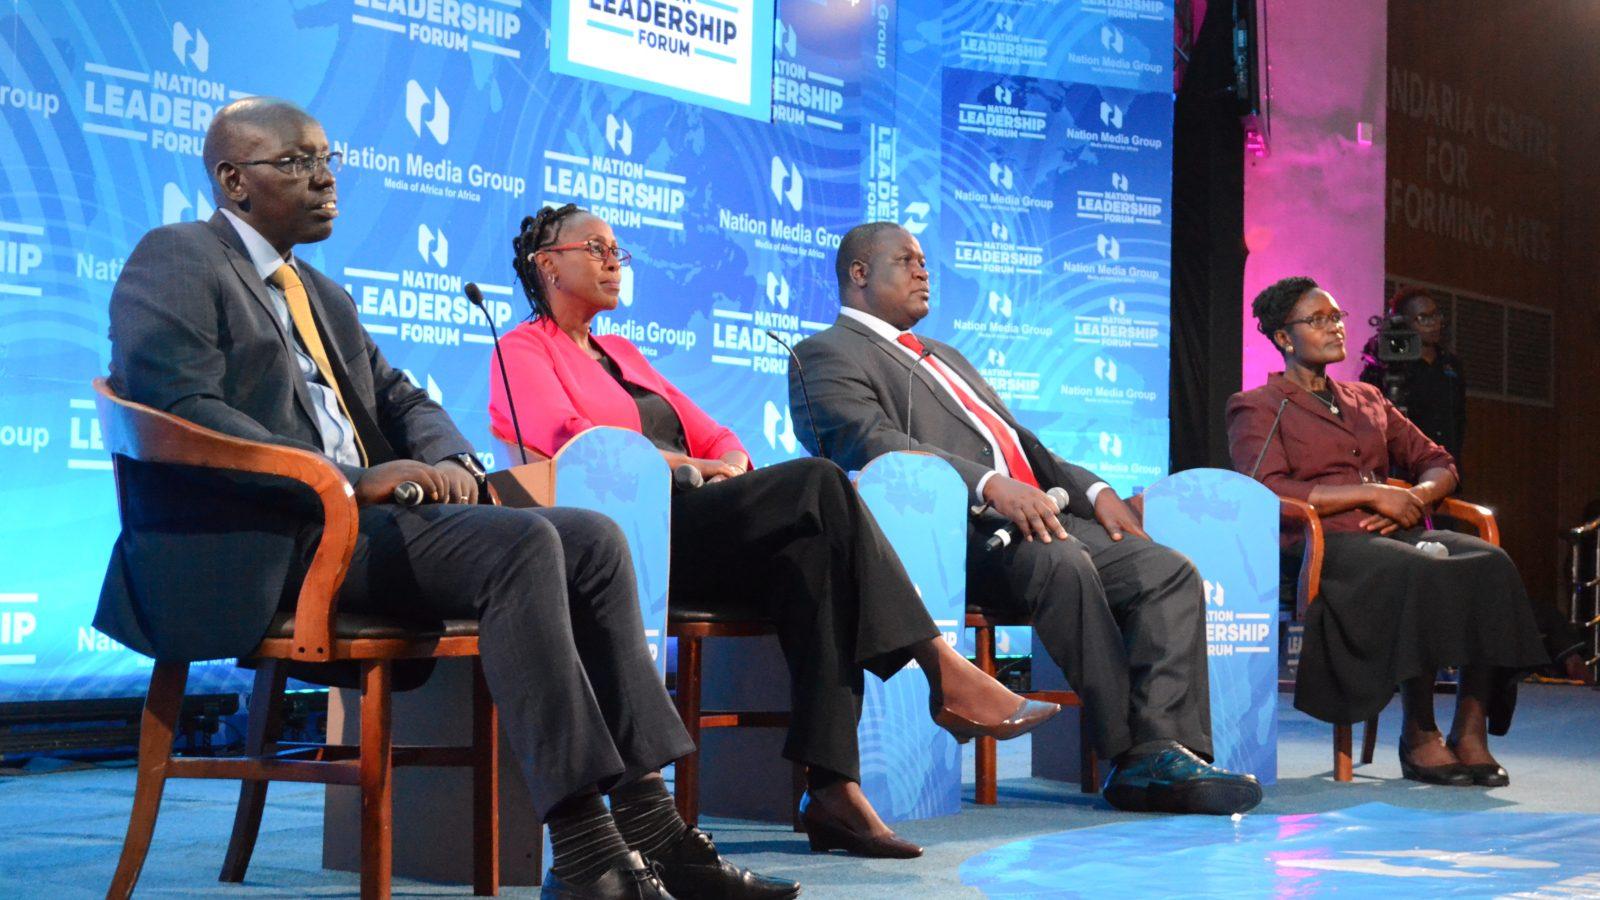 7th Edition of Nation Leadership Forum Focuses on Education